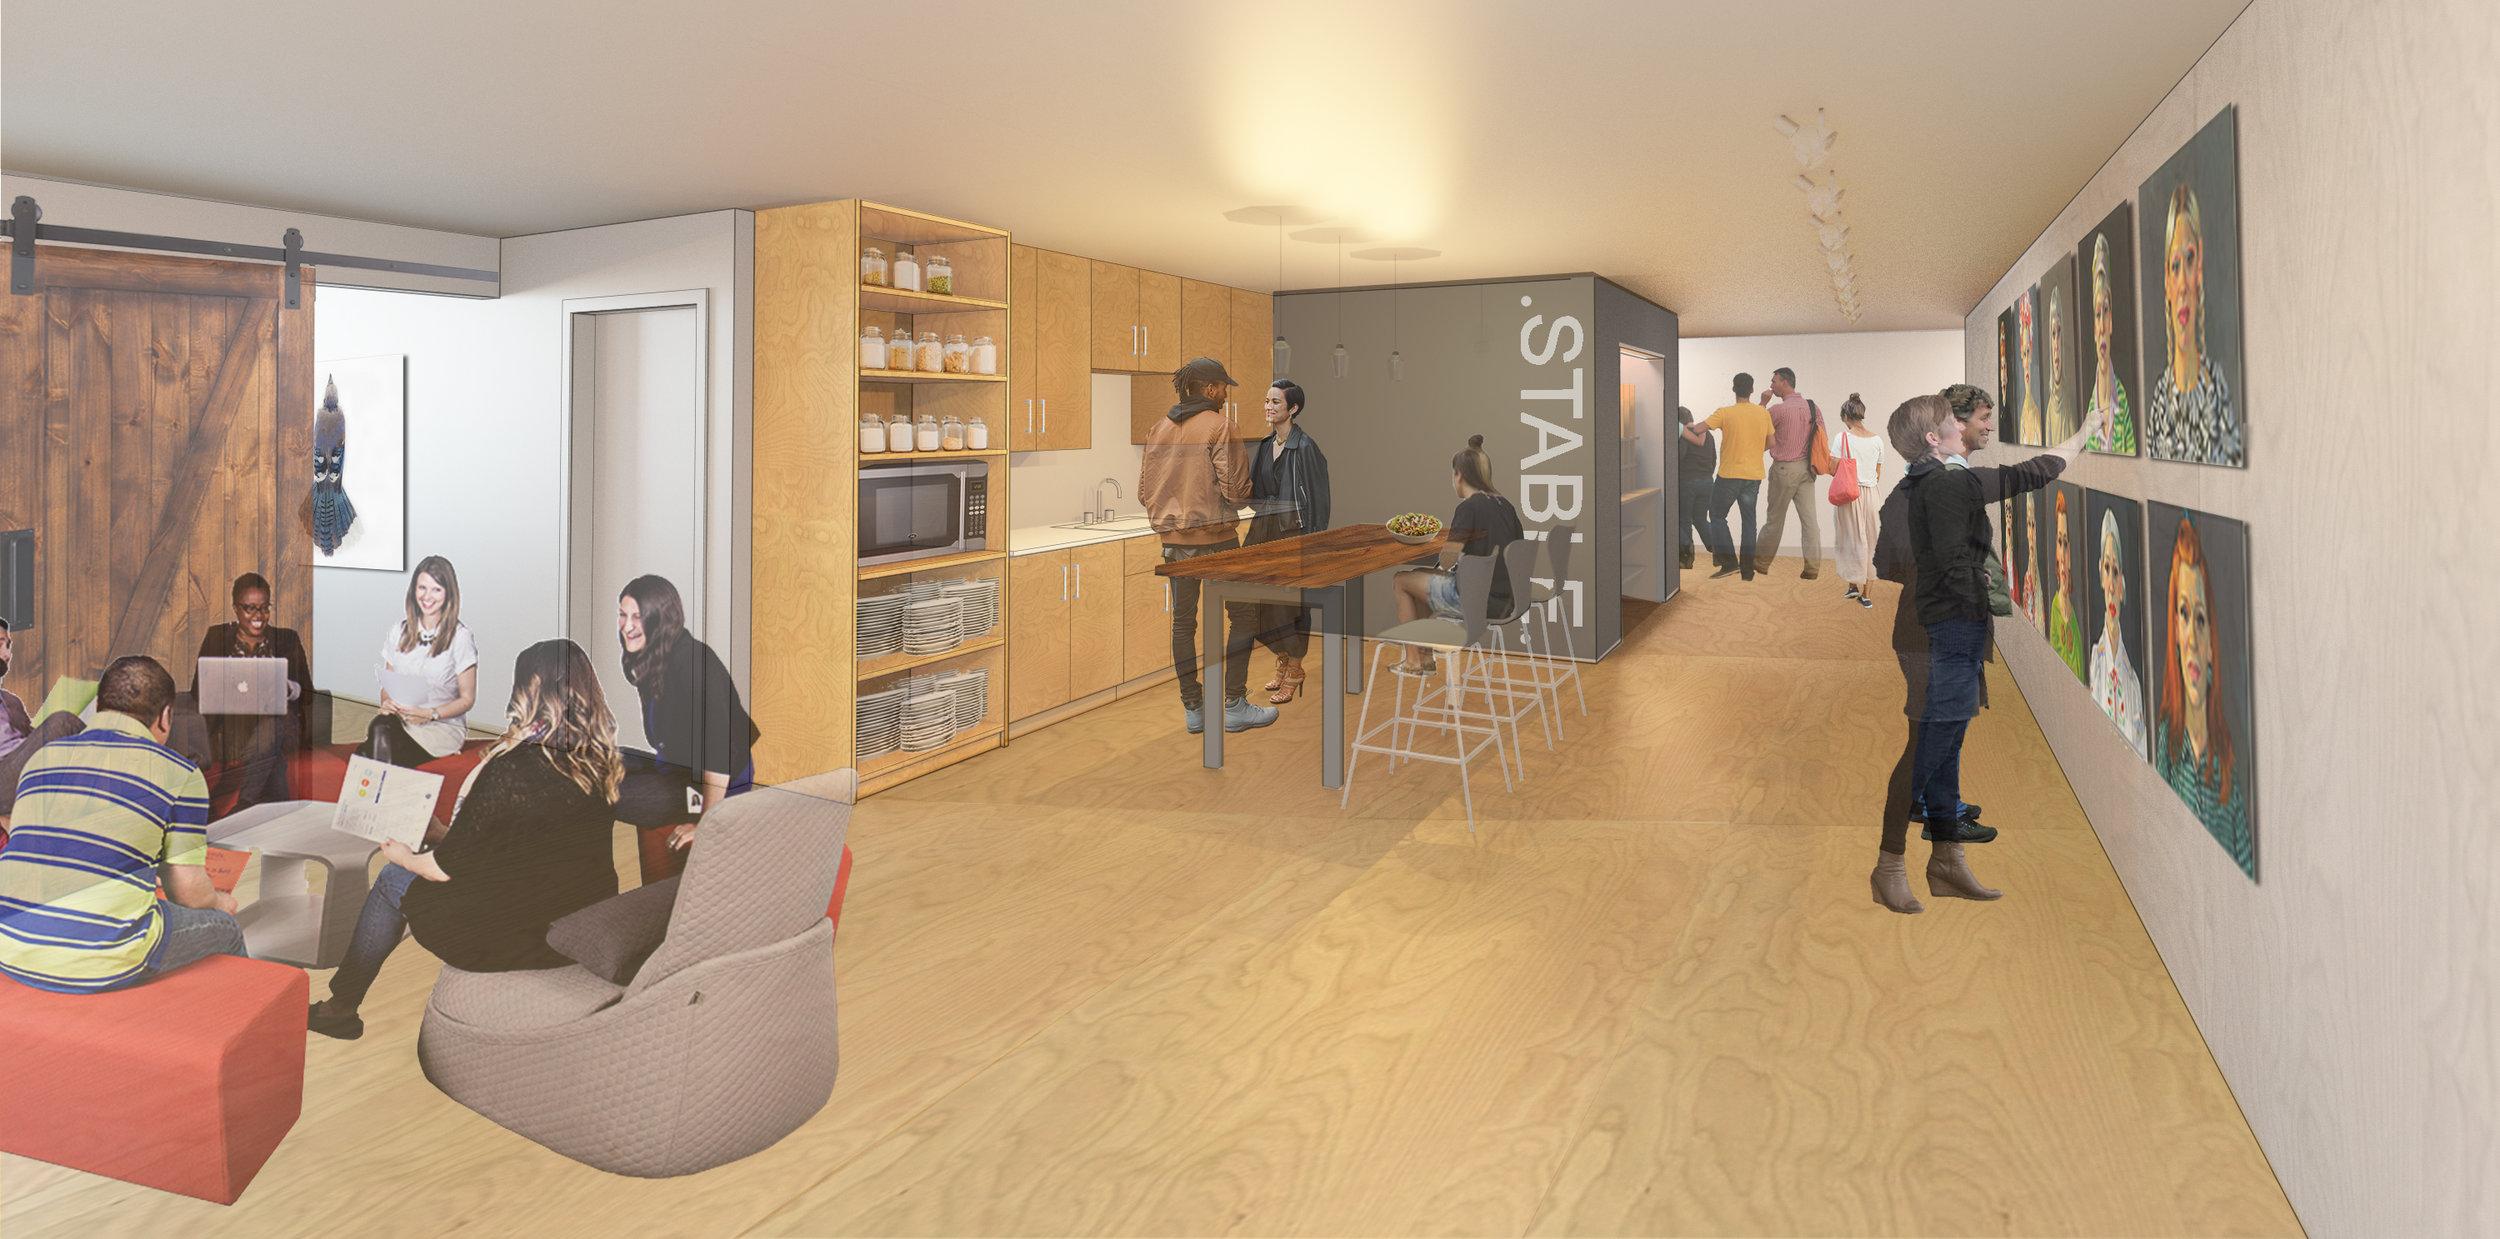 Exterior+Lounge+Base+render.jpg